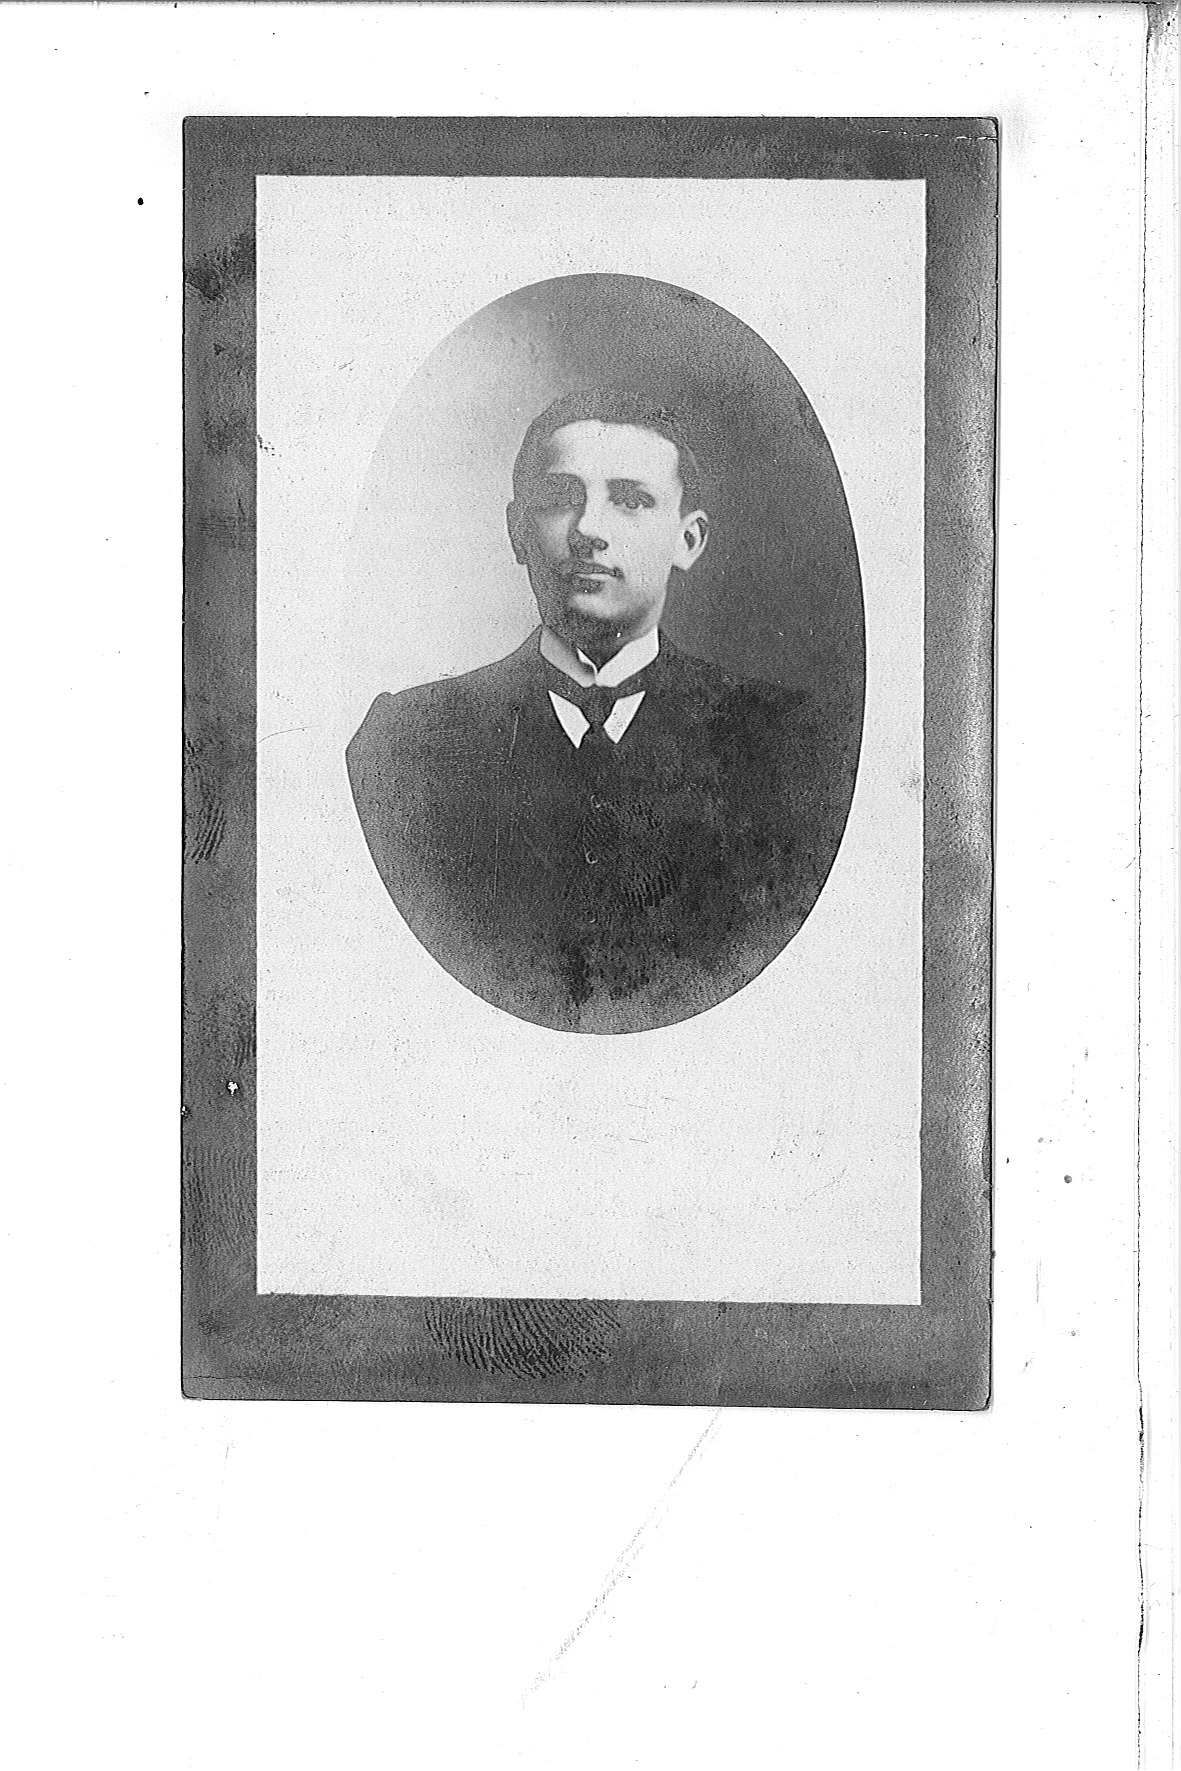 Albert-Hilaire(1910)20101006133005_00017.jpg